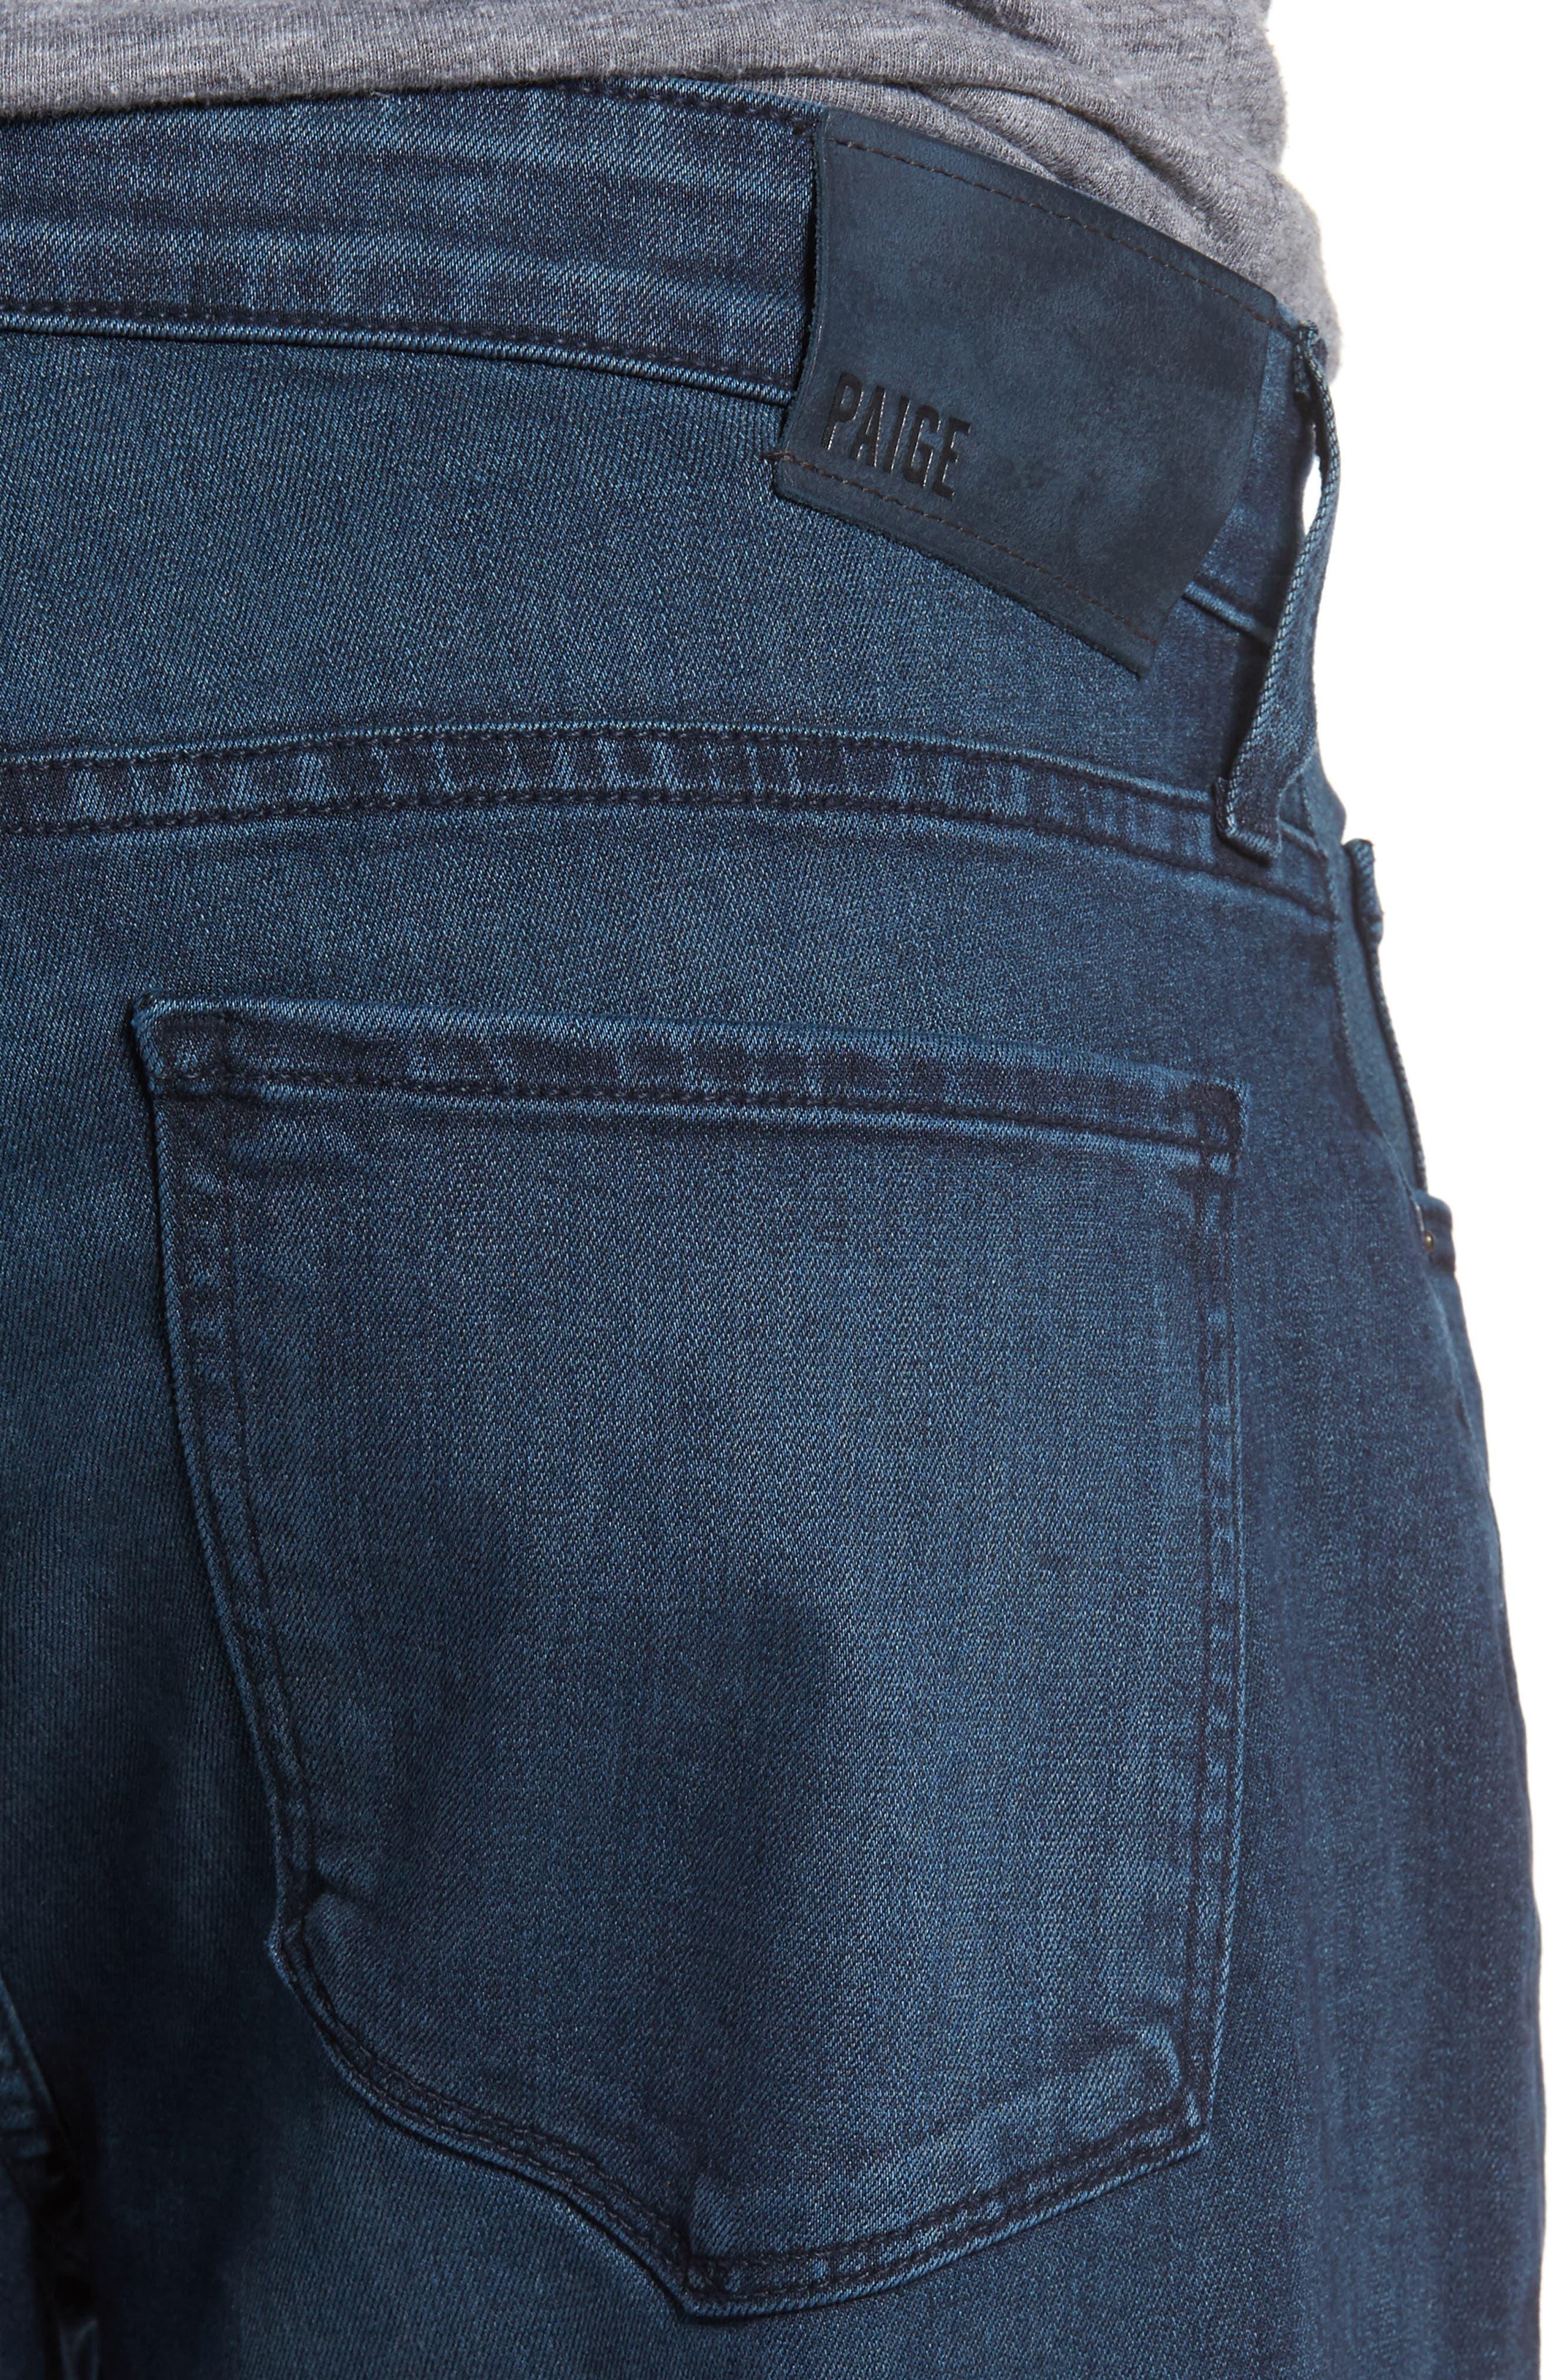 Transcend - Federal Slim Straight Fit Jeans,                             Alternate thumbnail 4, color,                             400